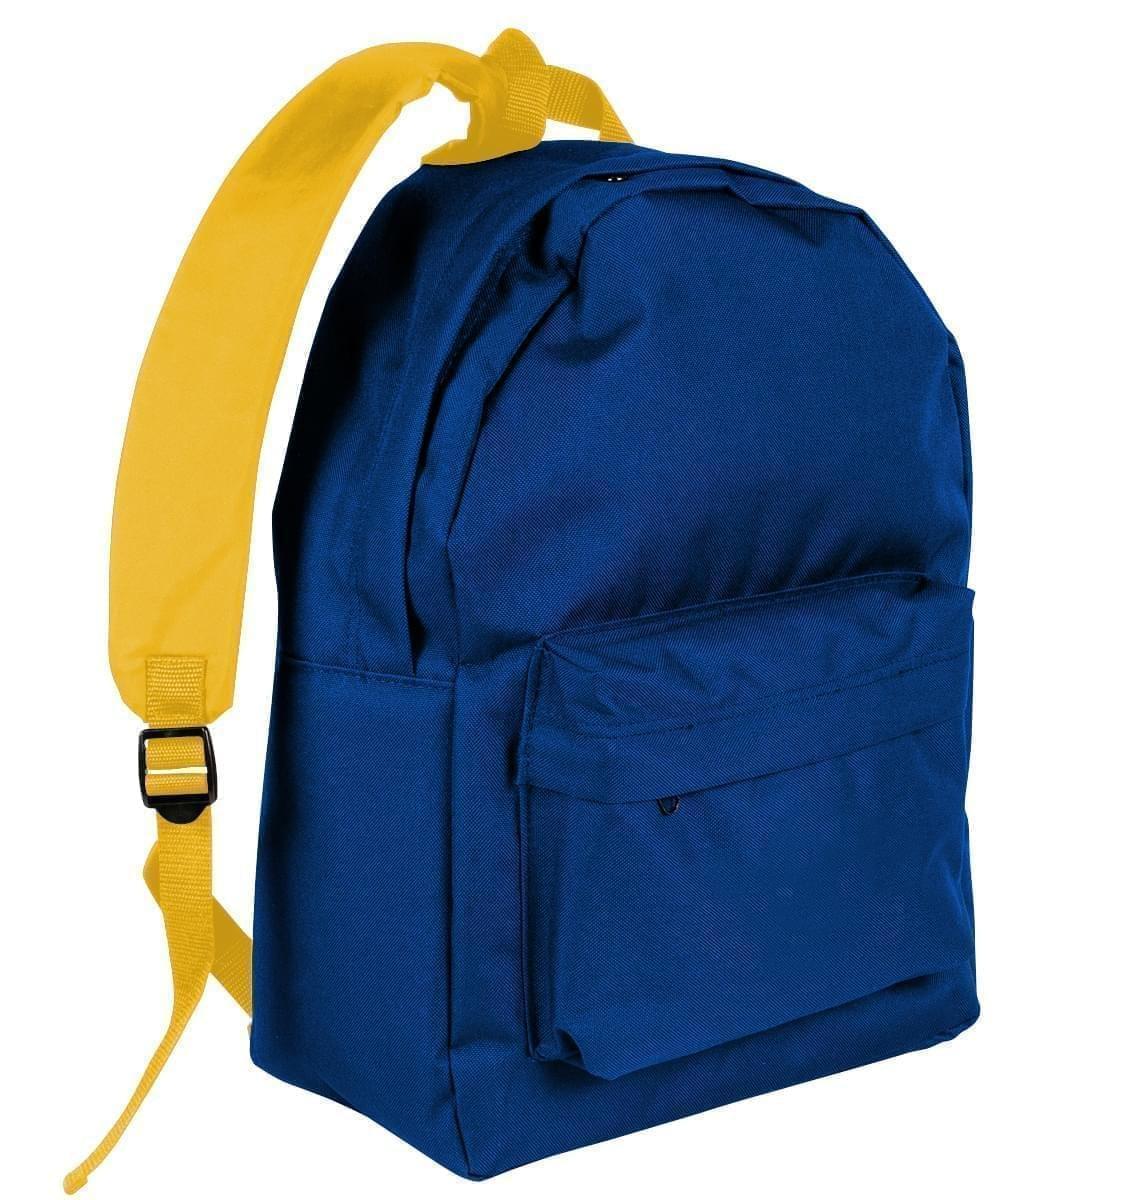 USA Made Nylon Poly Backpack Knapsacks, Royal Blue-Gold, 8960-A05